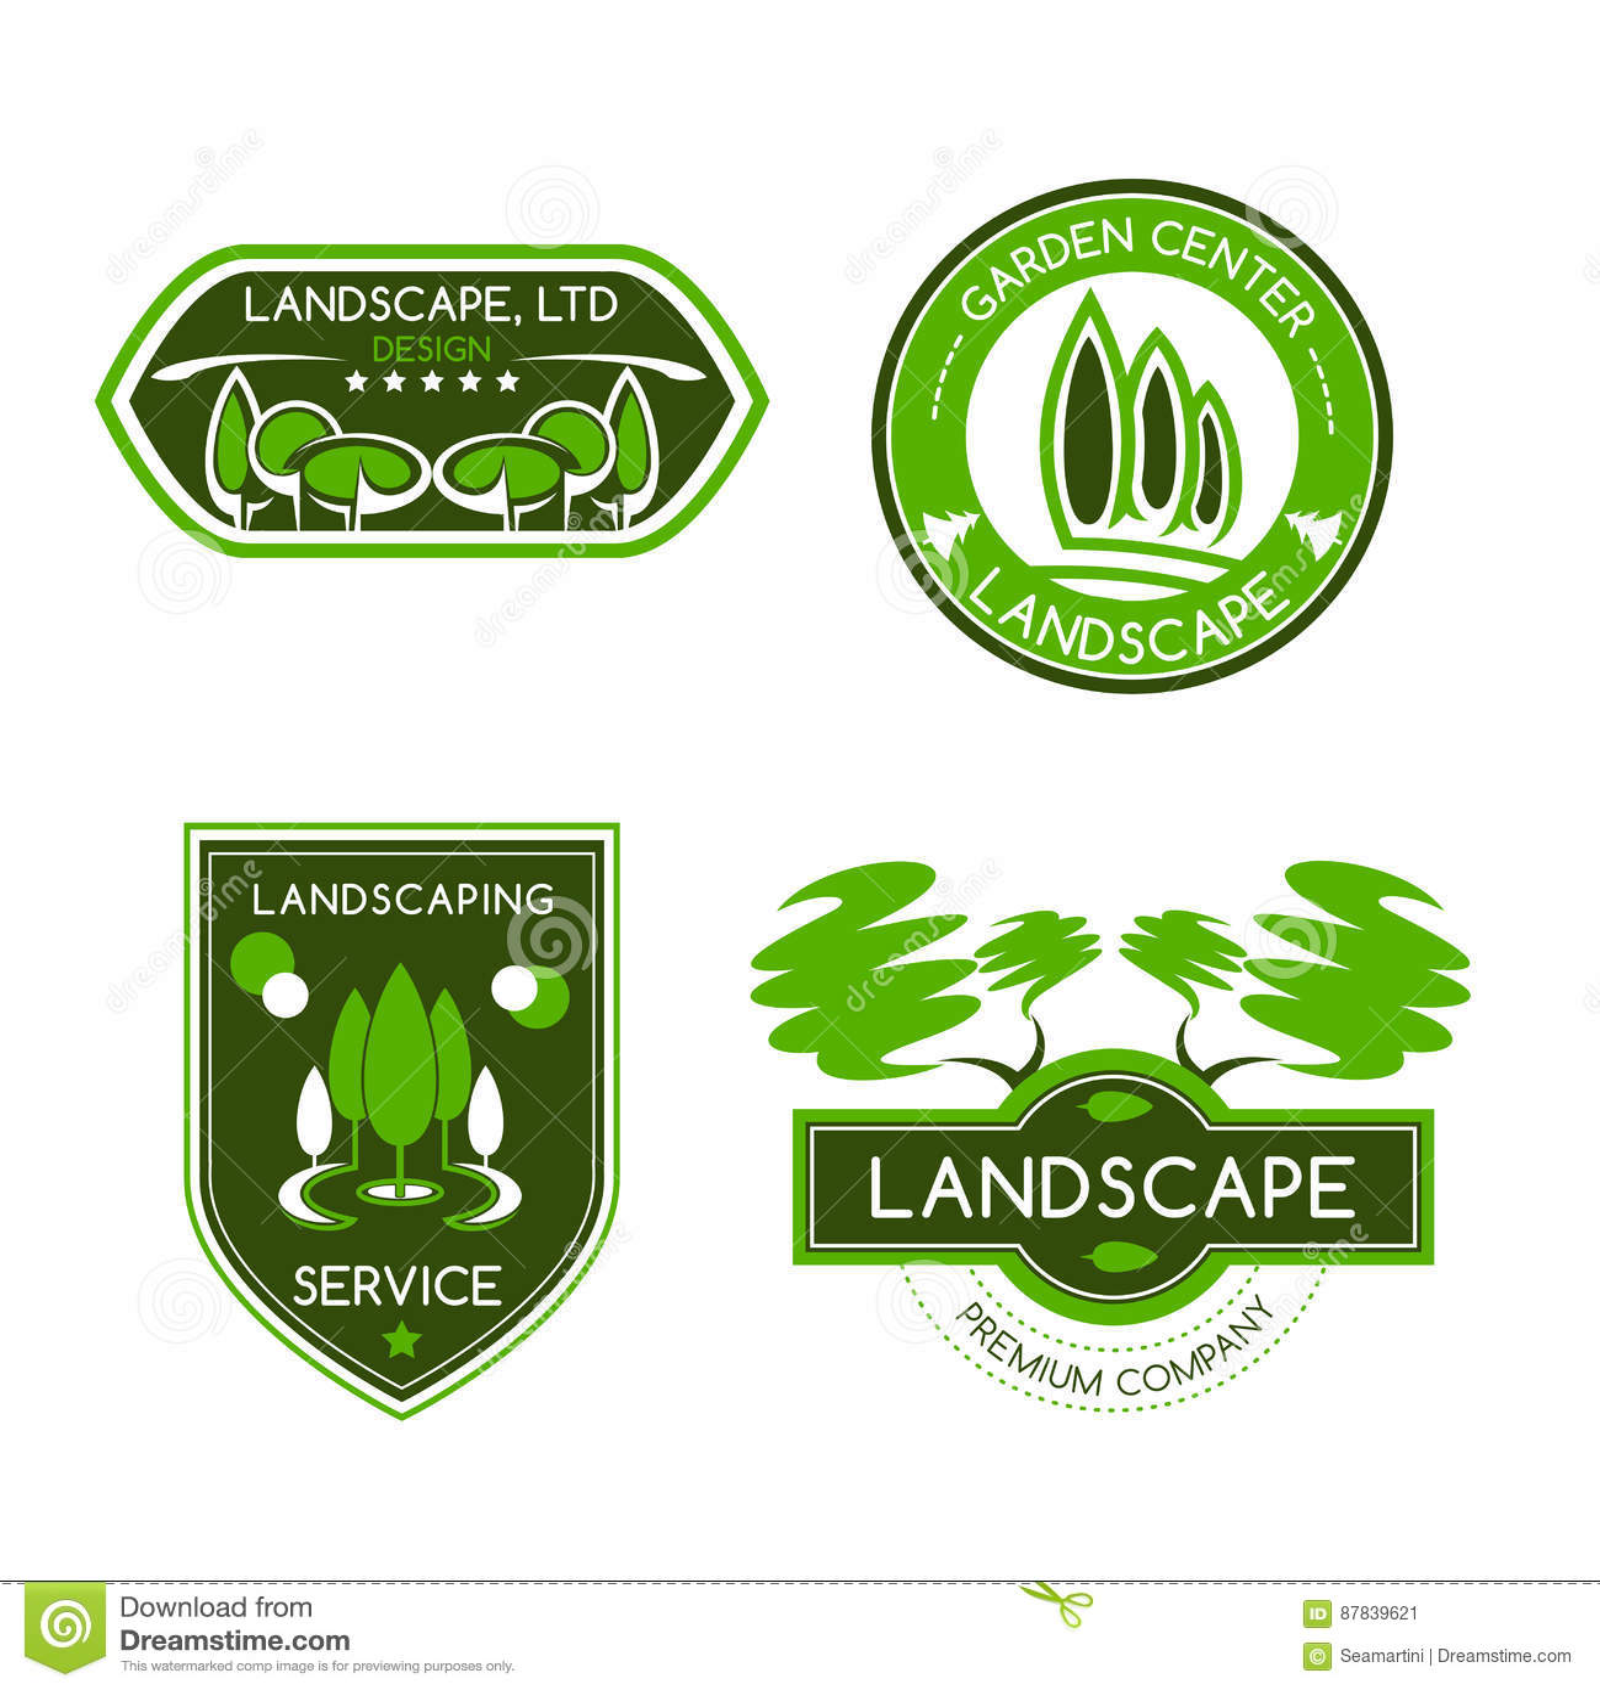 Landscape Design Studio Label Set Stock Vector Illustration Of Identity Organic 87839621